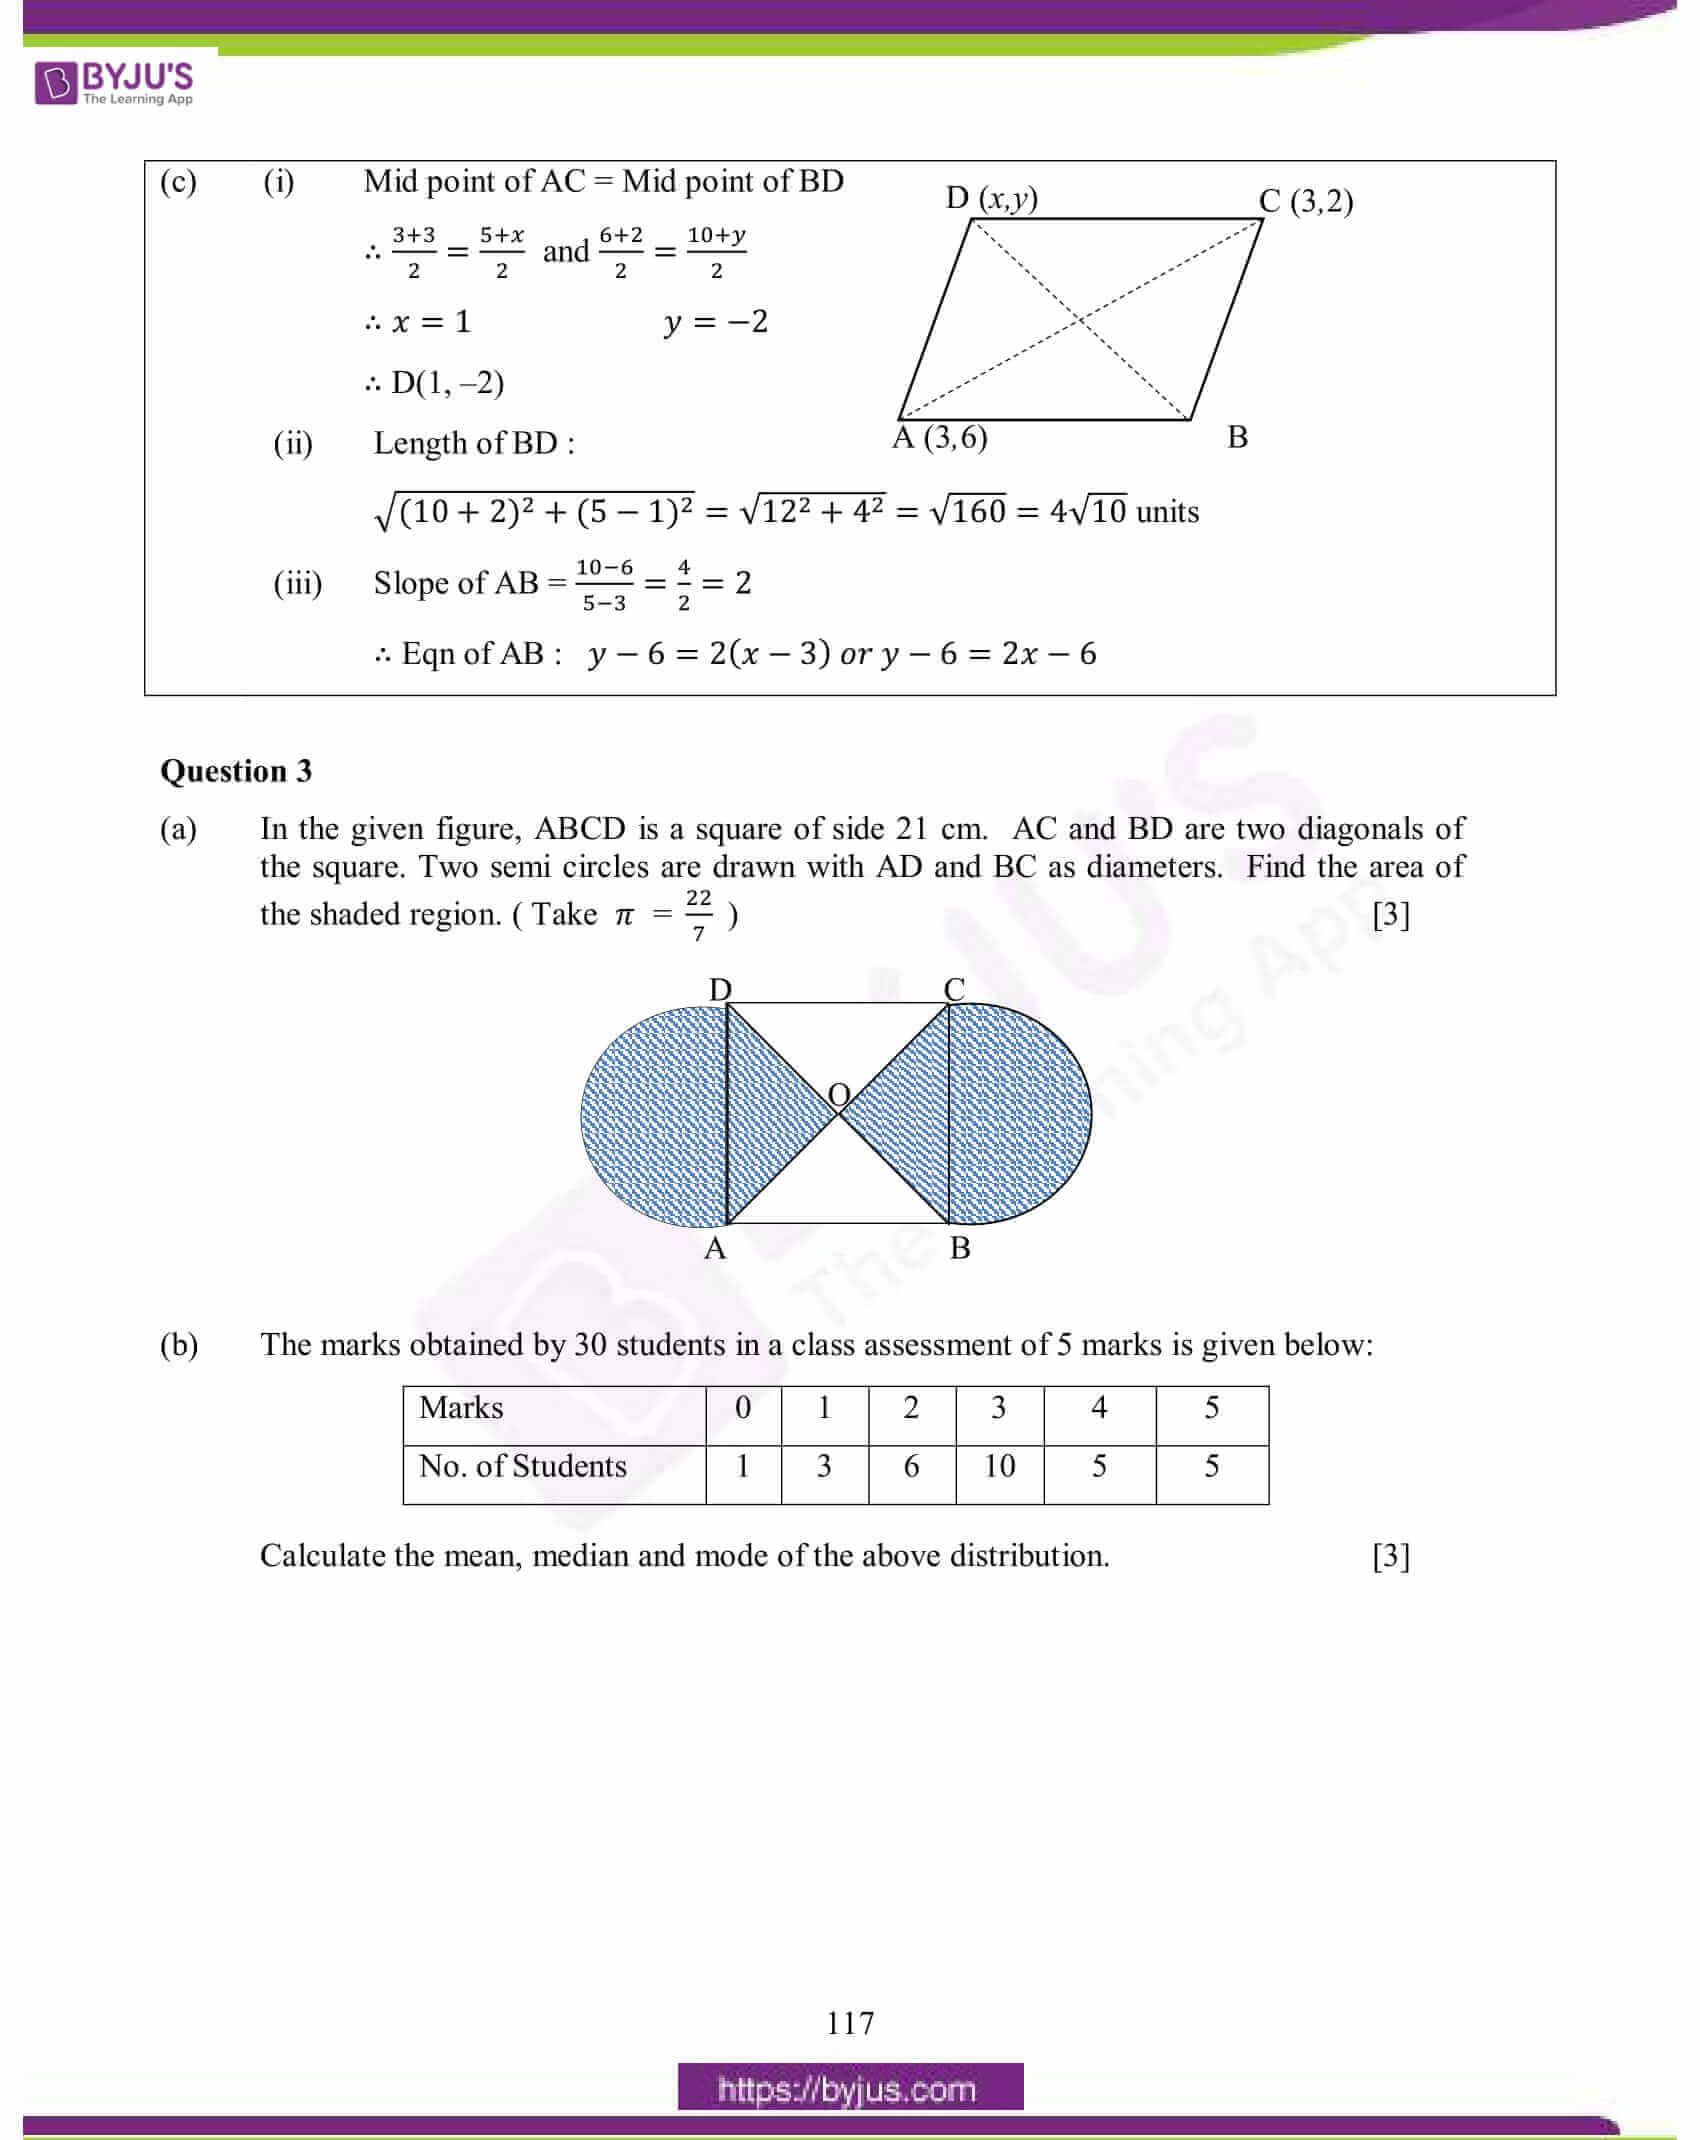 icse class 10 maths question paper solution 2015 05